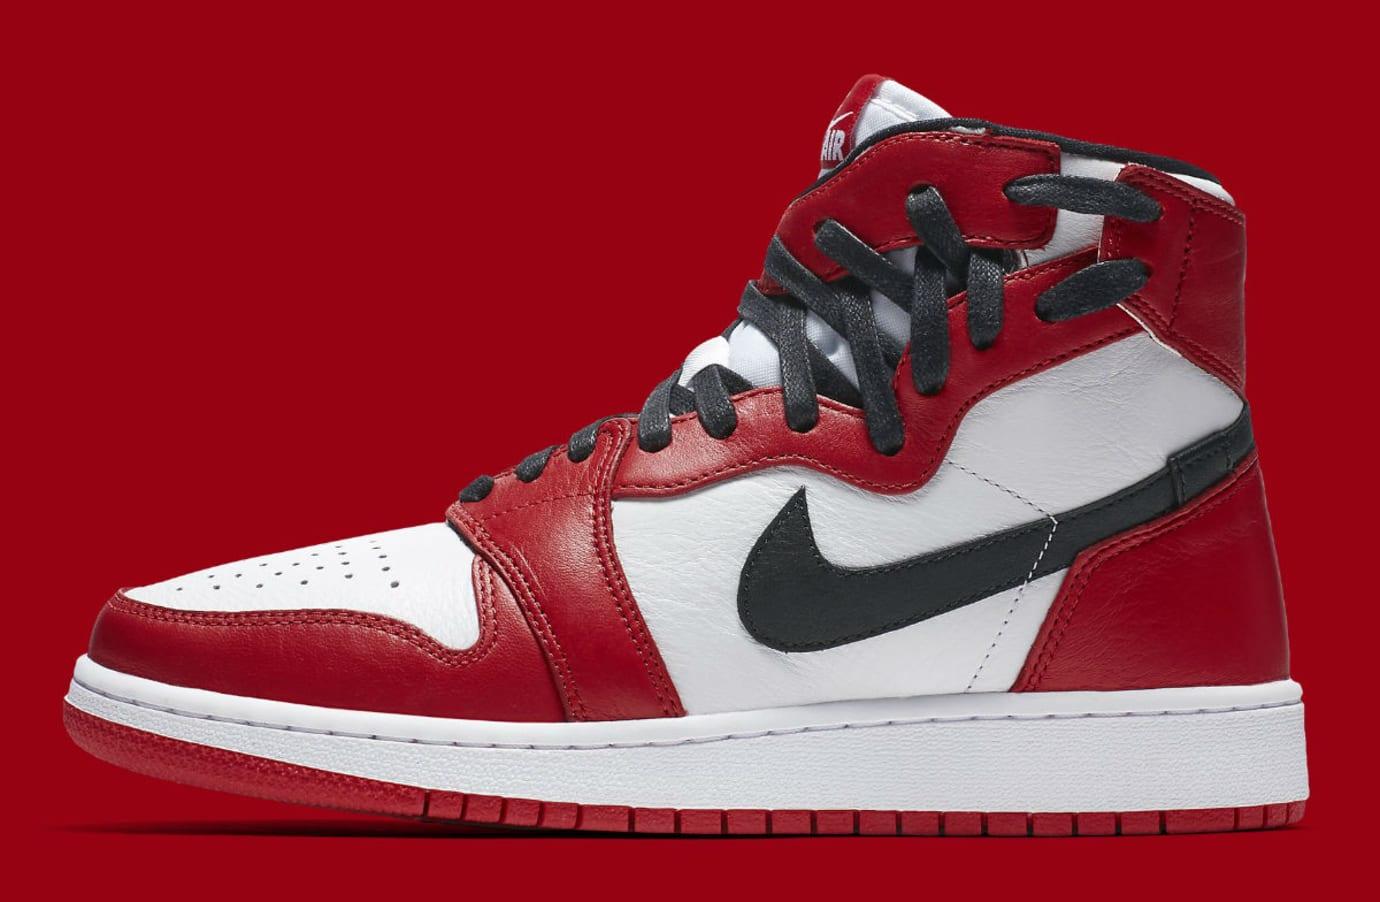 Air Jordan 1 I Rebel XX Chicago Release Date AT4151-100 Profile